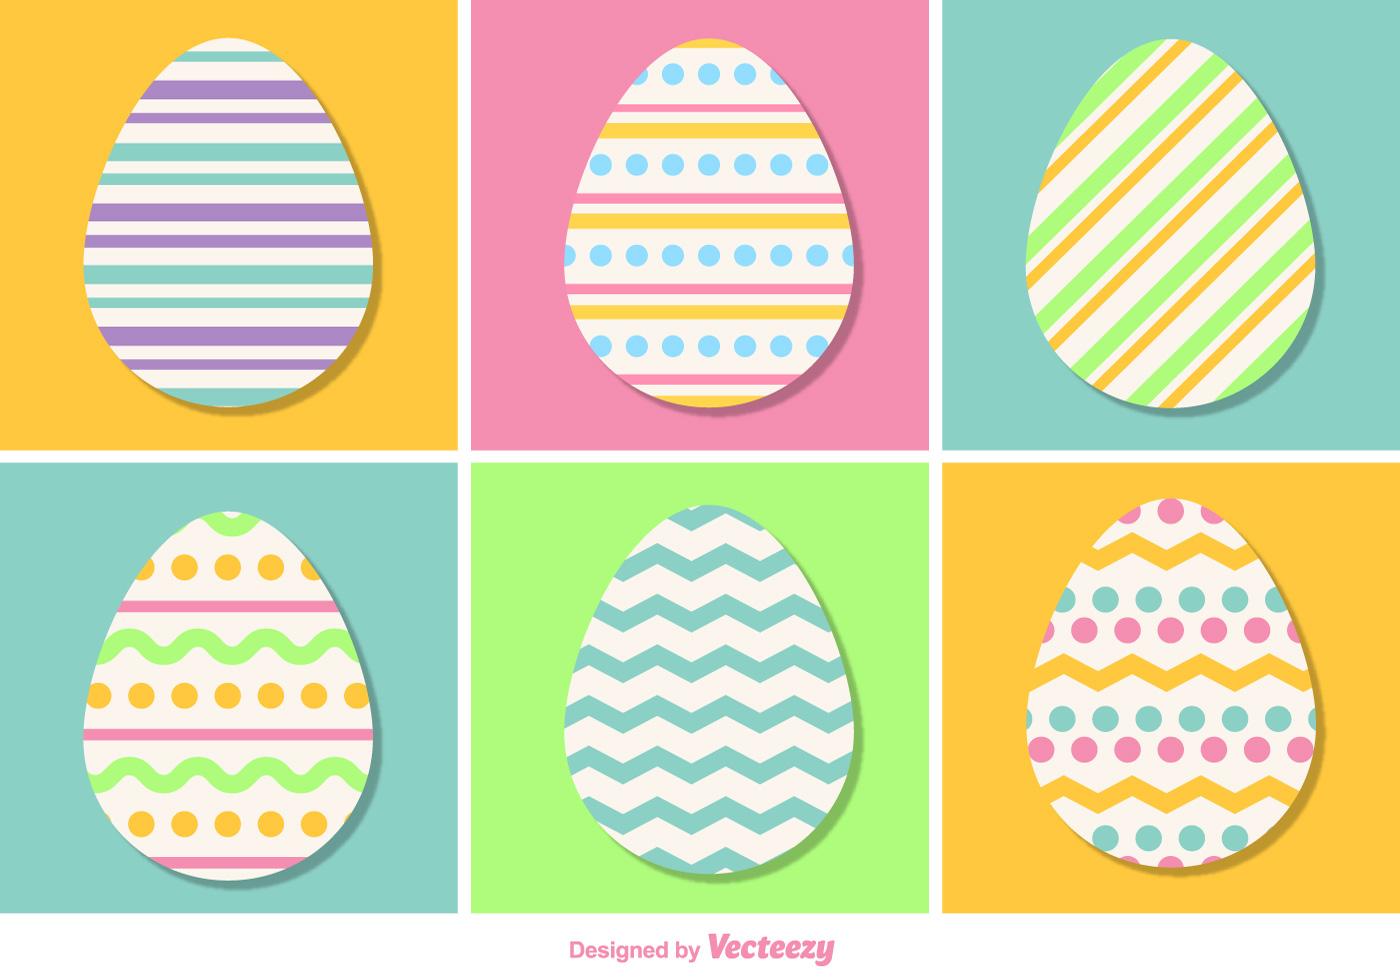 Pastel Color Vector Easter Eggs - Download Free Vectors, Clipart